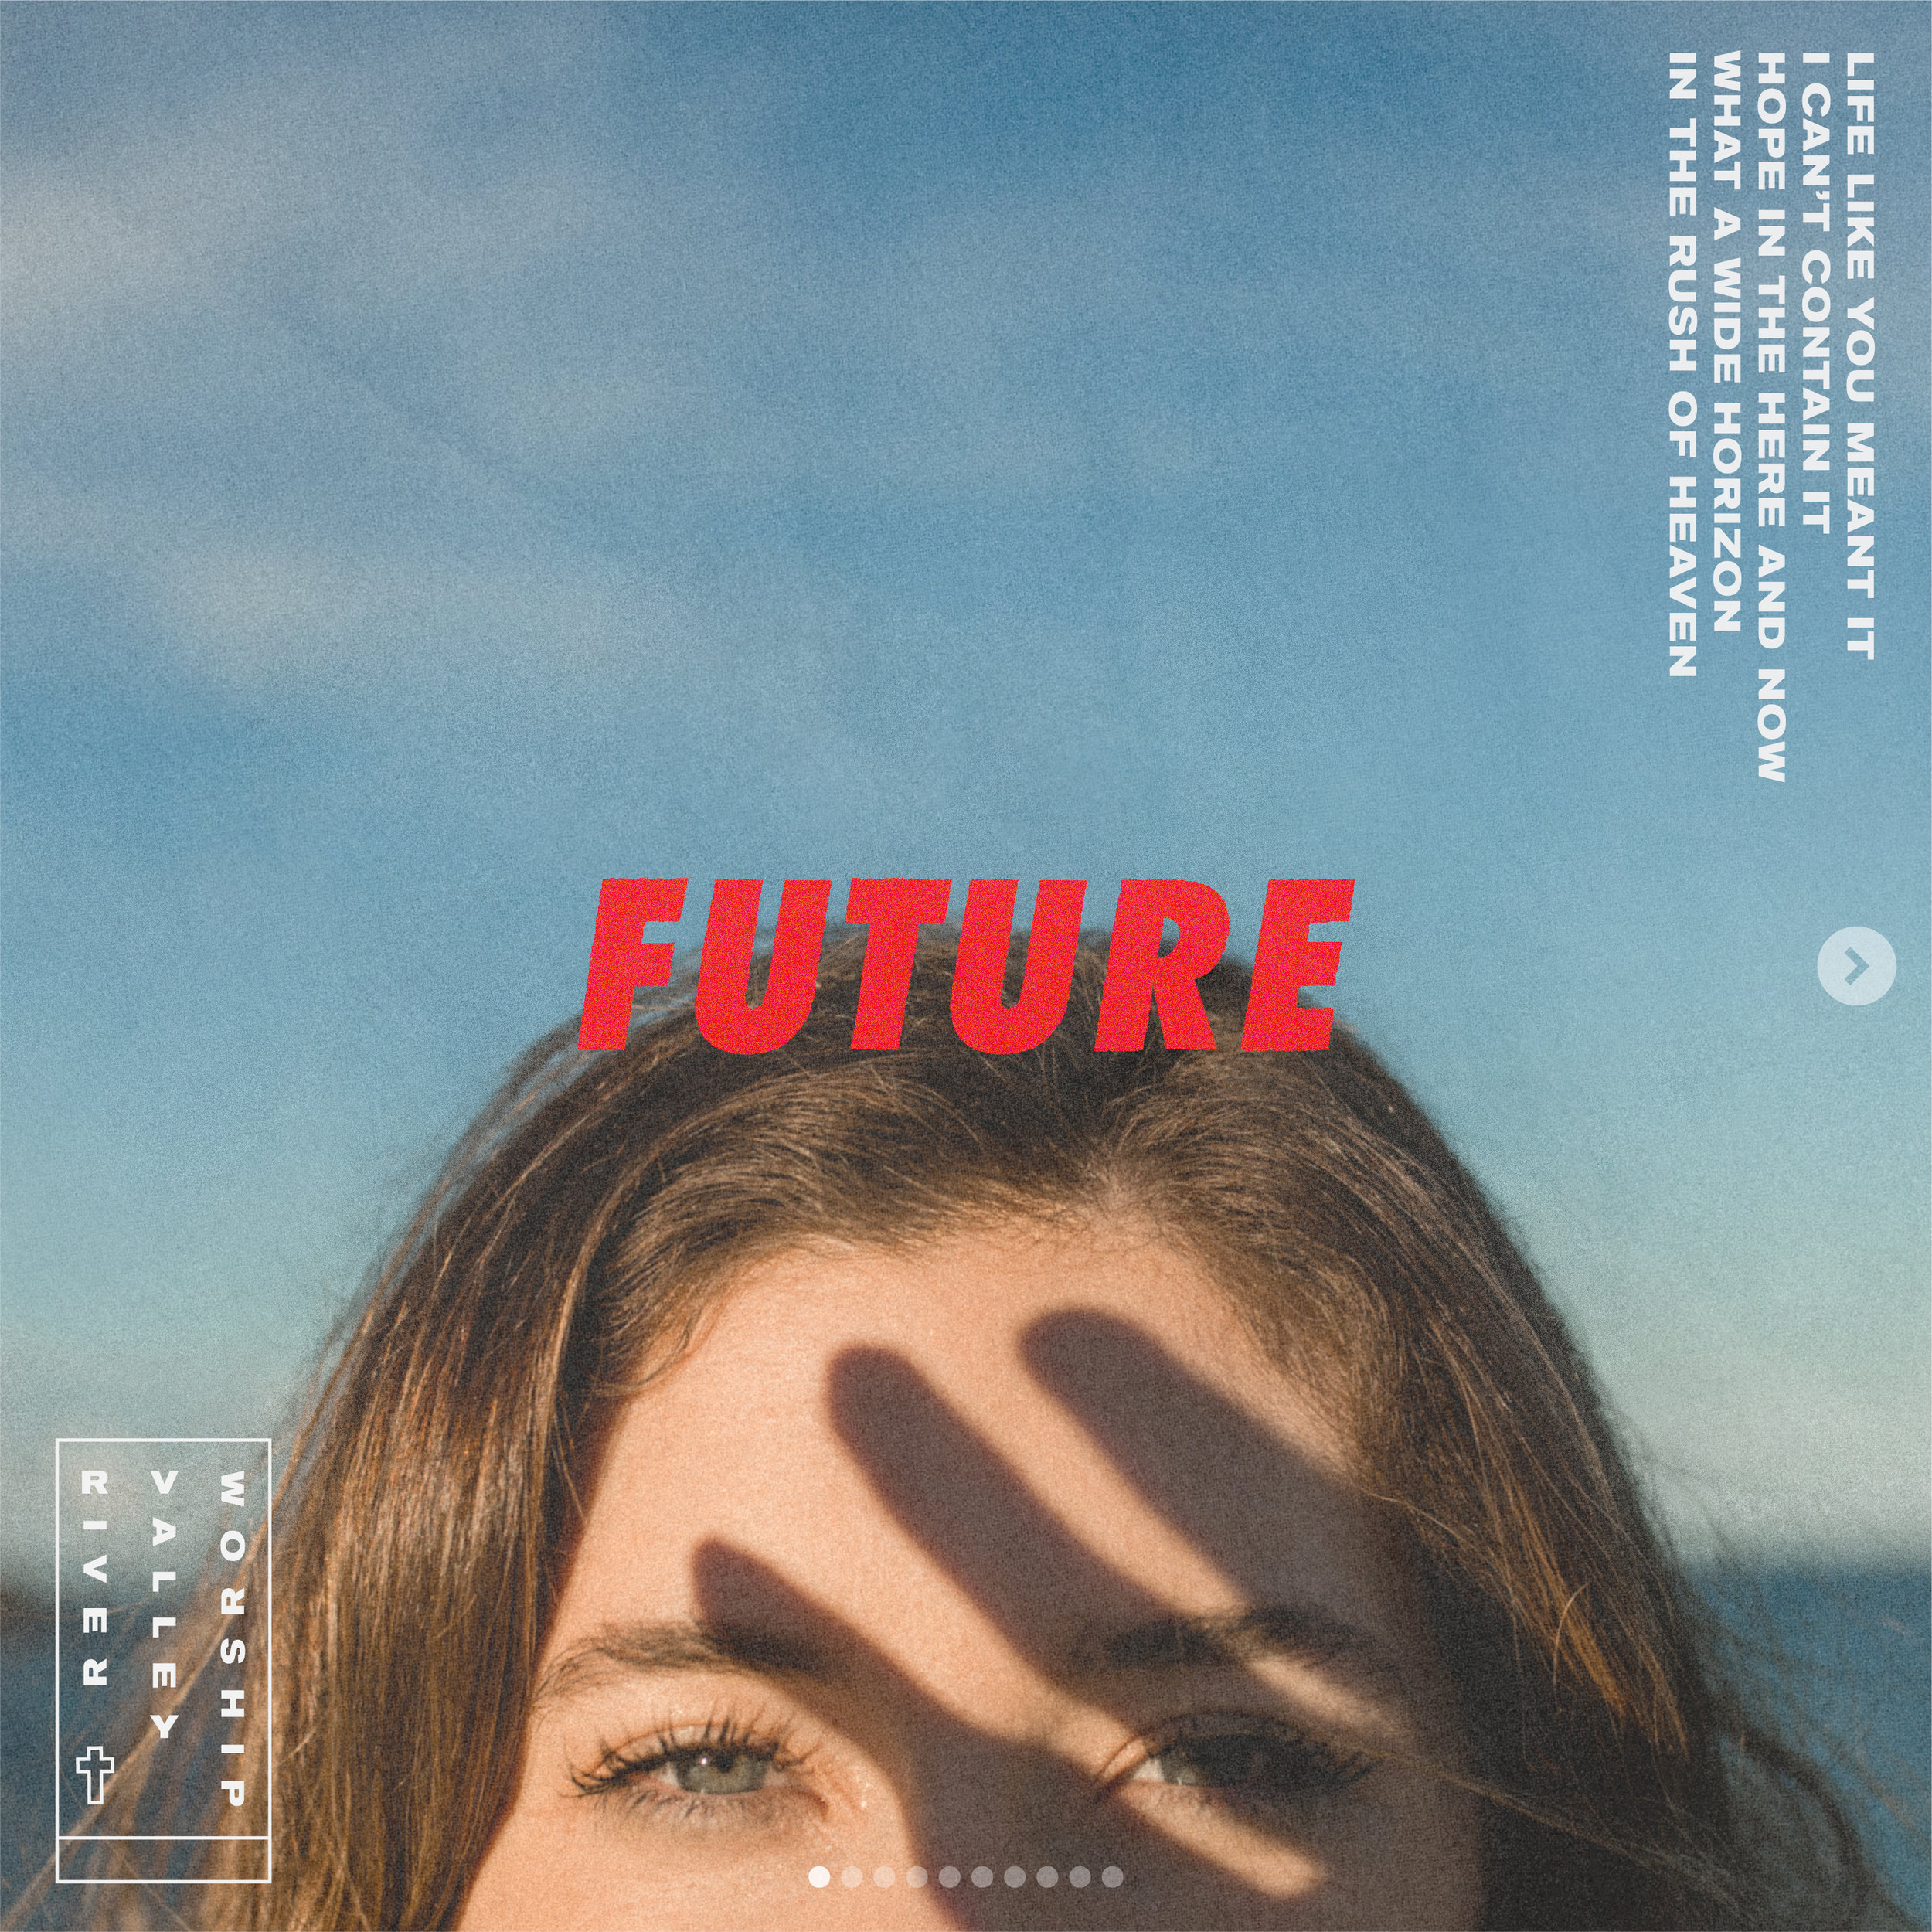 FUTURE_SINGLE (1).jpg